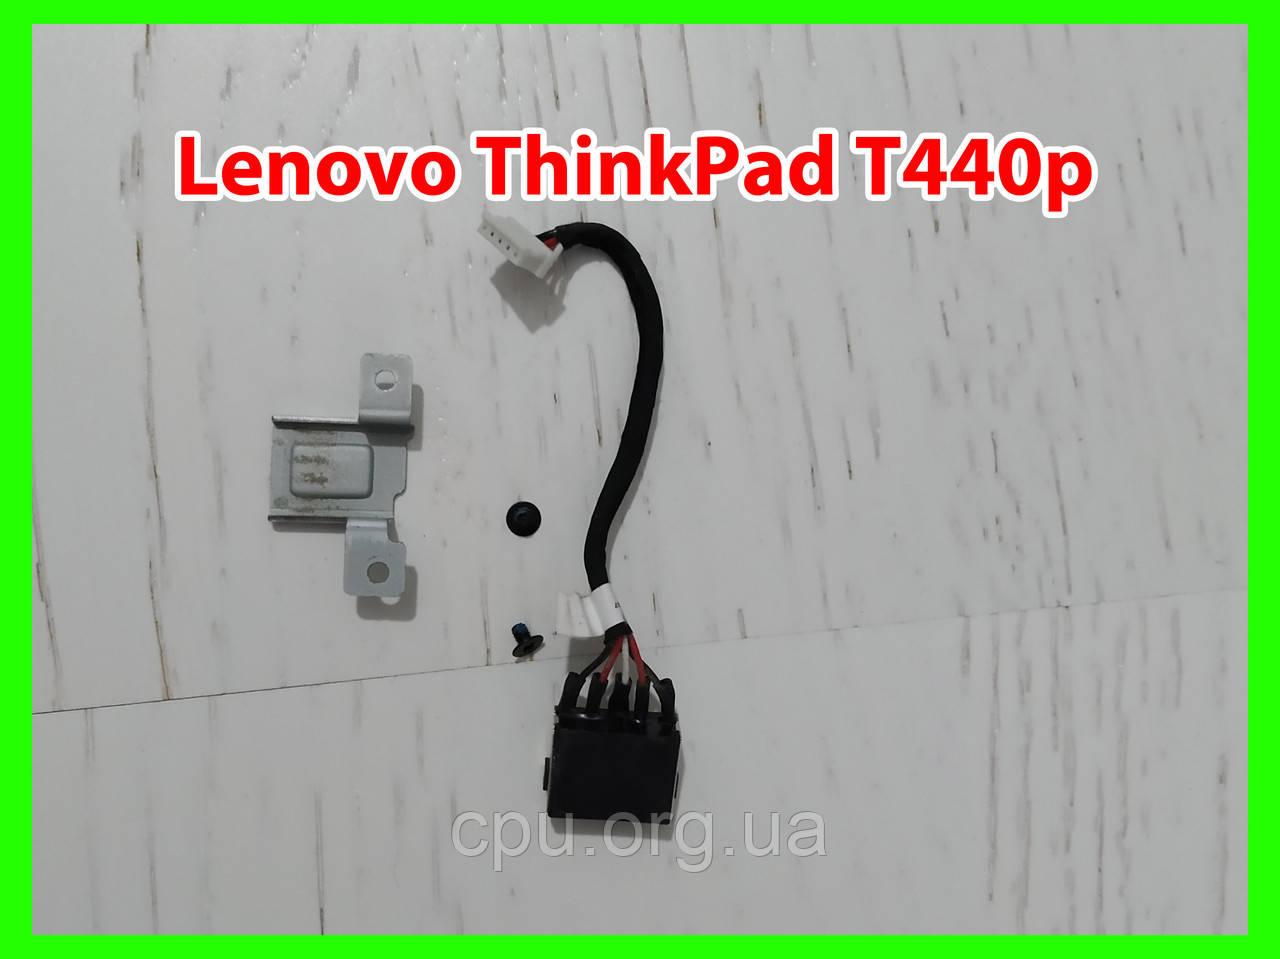 Разъем / гнездо питания power cable Lenovo ThinkPad T440p